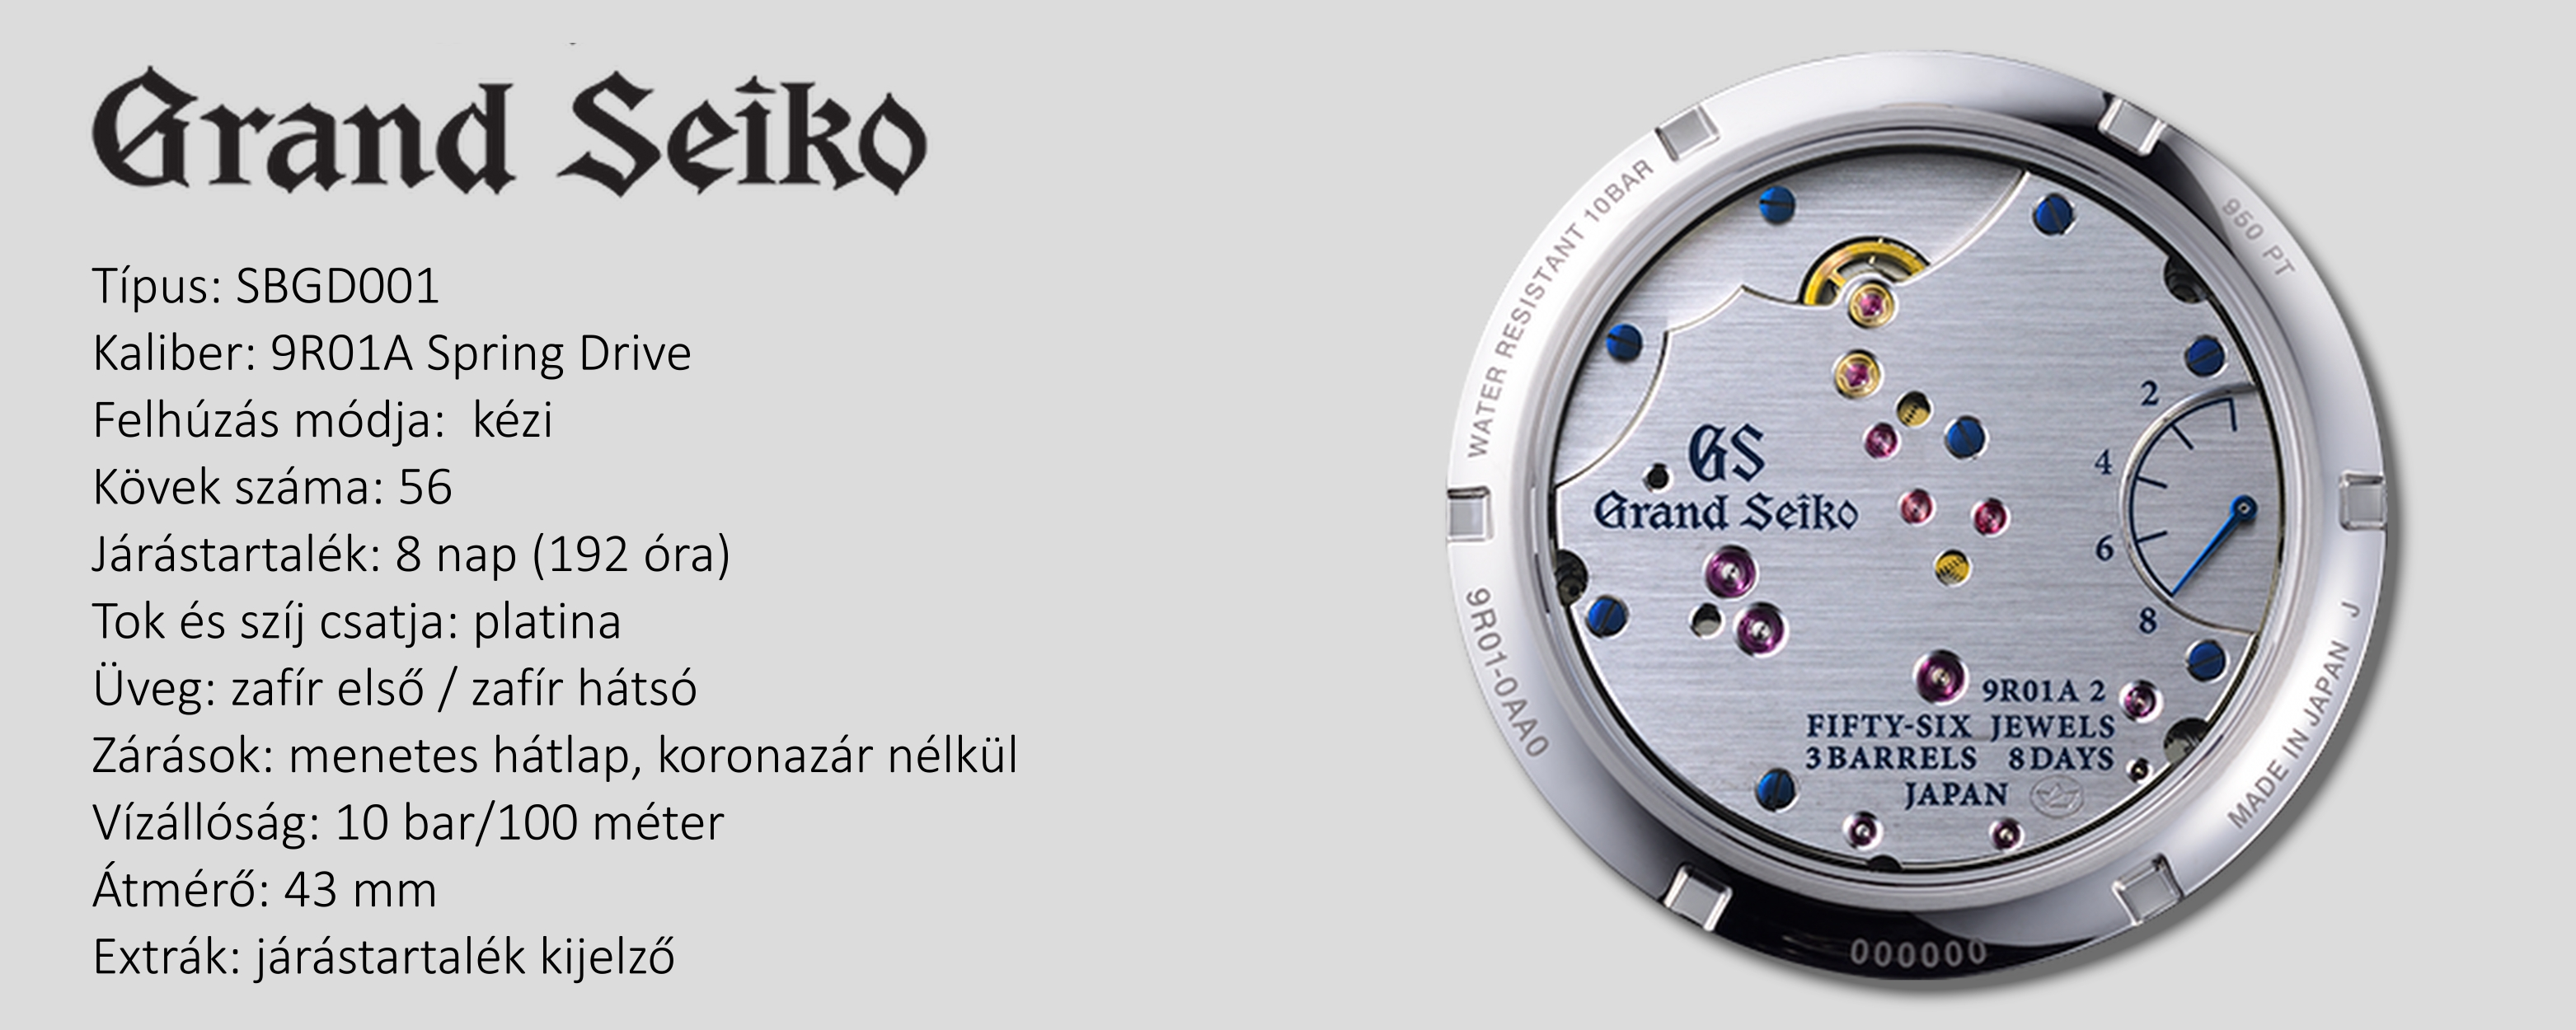 grand-seiko-002.jpg